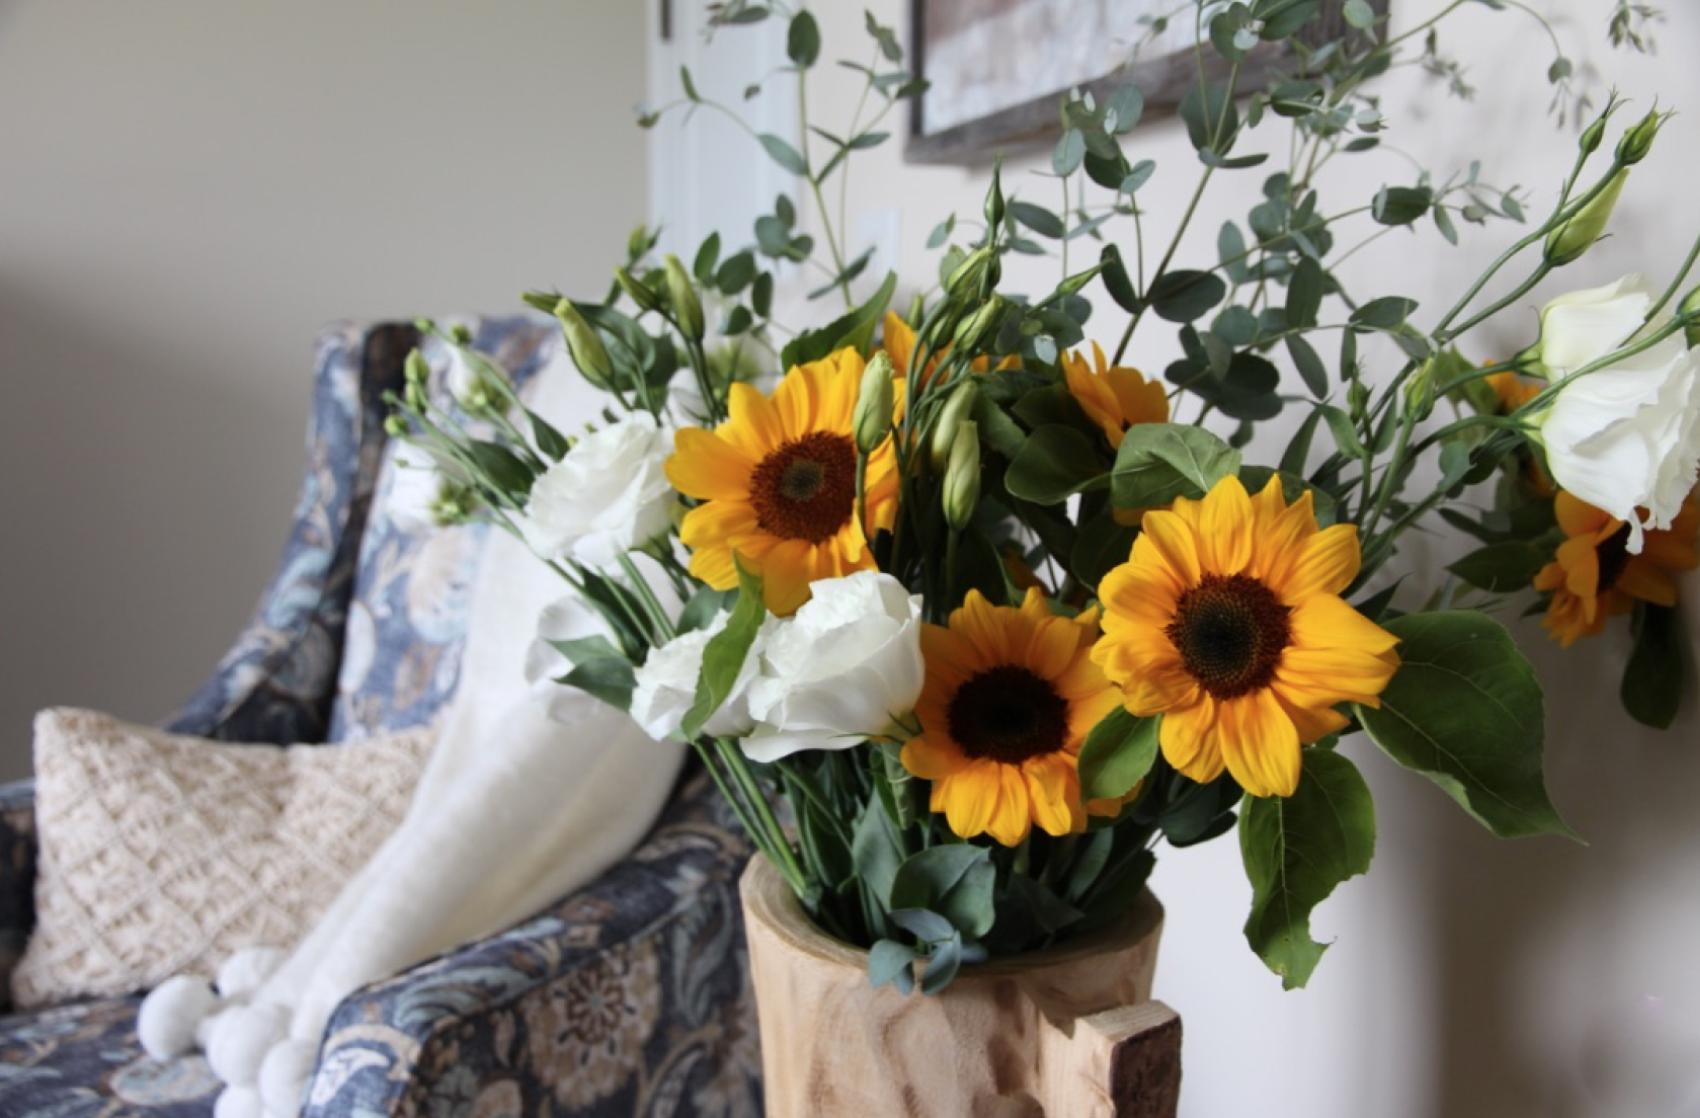 Sunflowers in wood vase